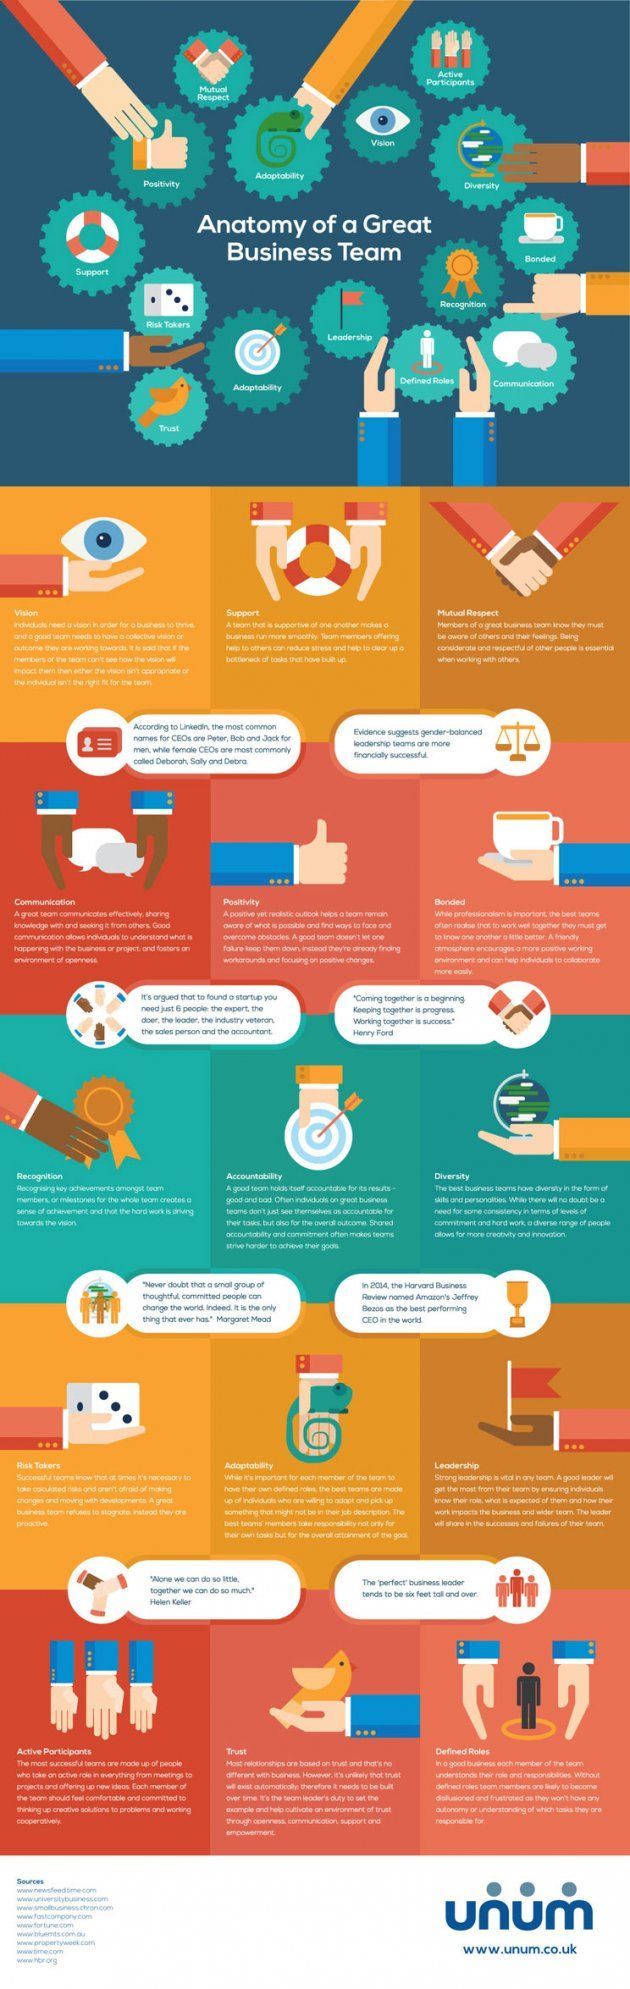 15 Characteristics Of Extraordinary Teams Infographic Infographic Health Infographics Design Infographic Health